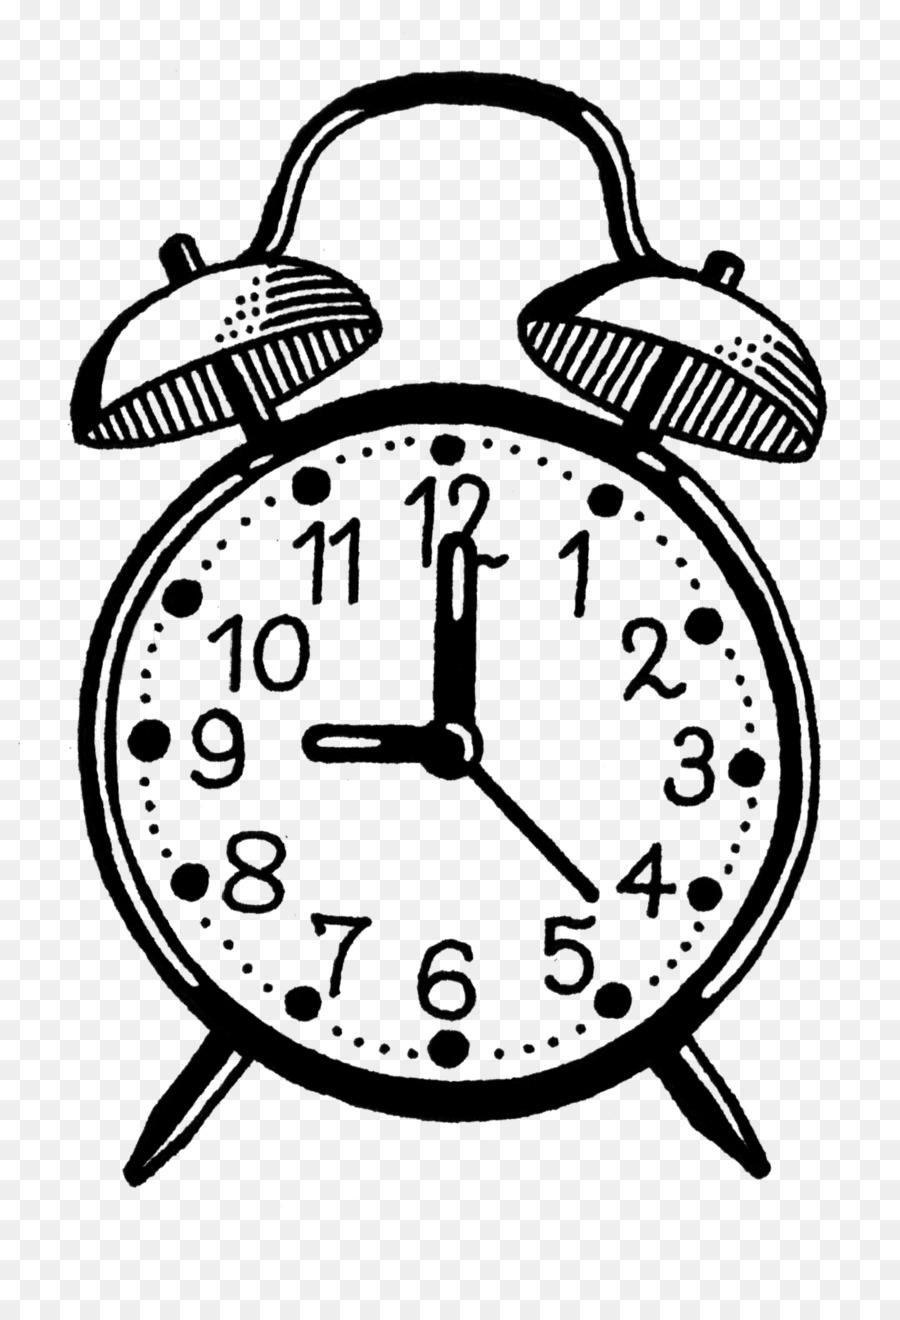 Cartoon clock font transparent. Clocks clipart dog